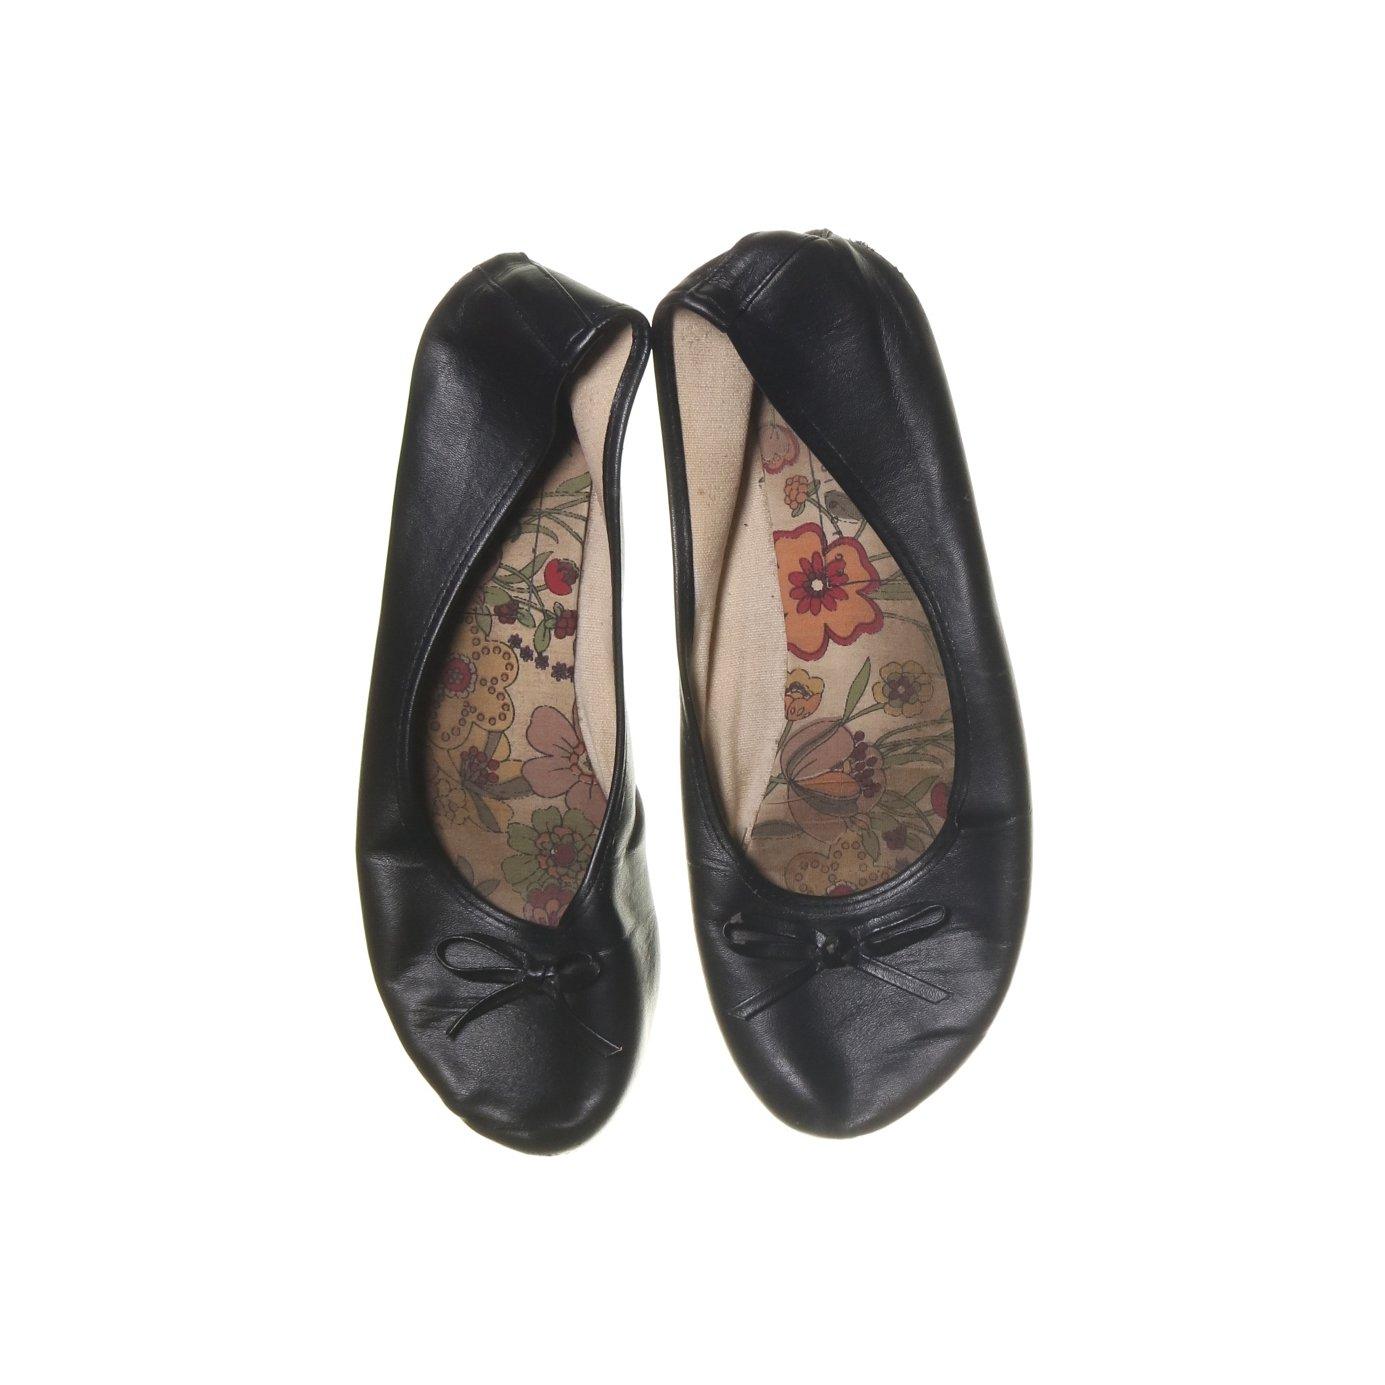 bpc bonprix collection, Ballerinaskor, Strl: 39, Svart